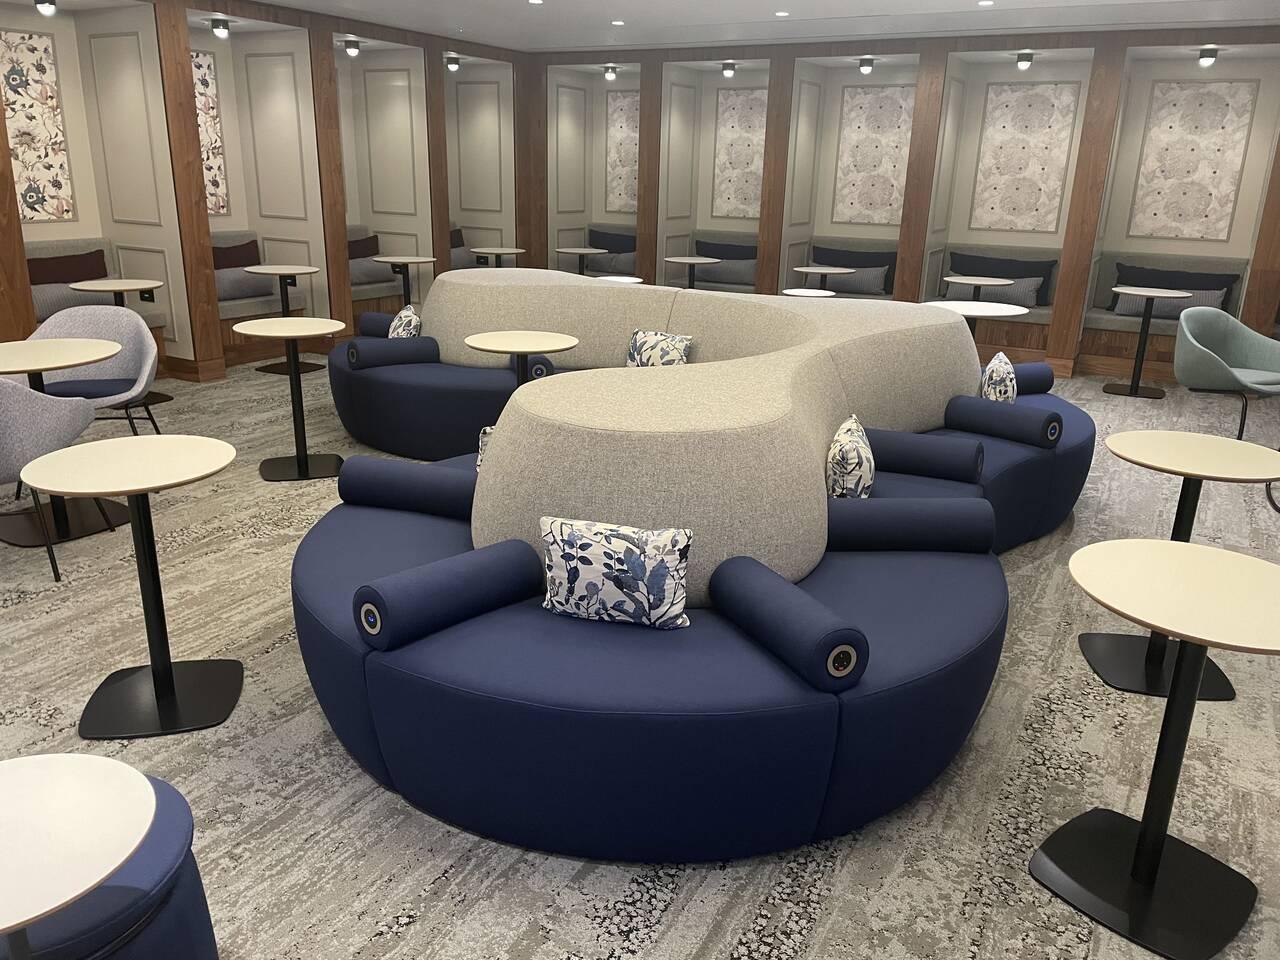 American Express Centurion Lounge seating Heathrow